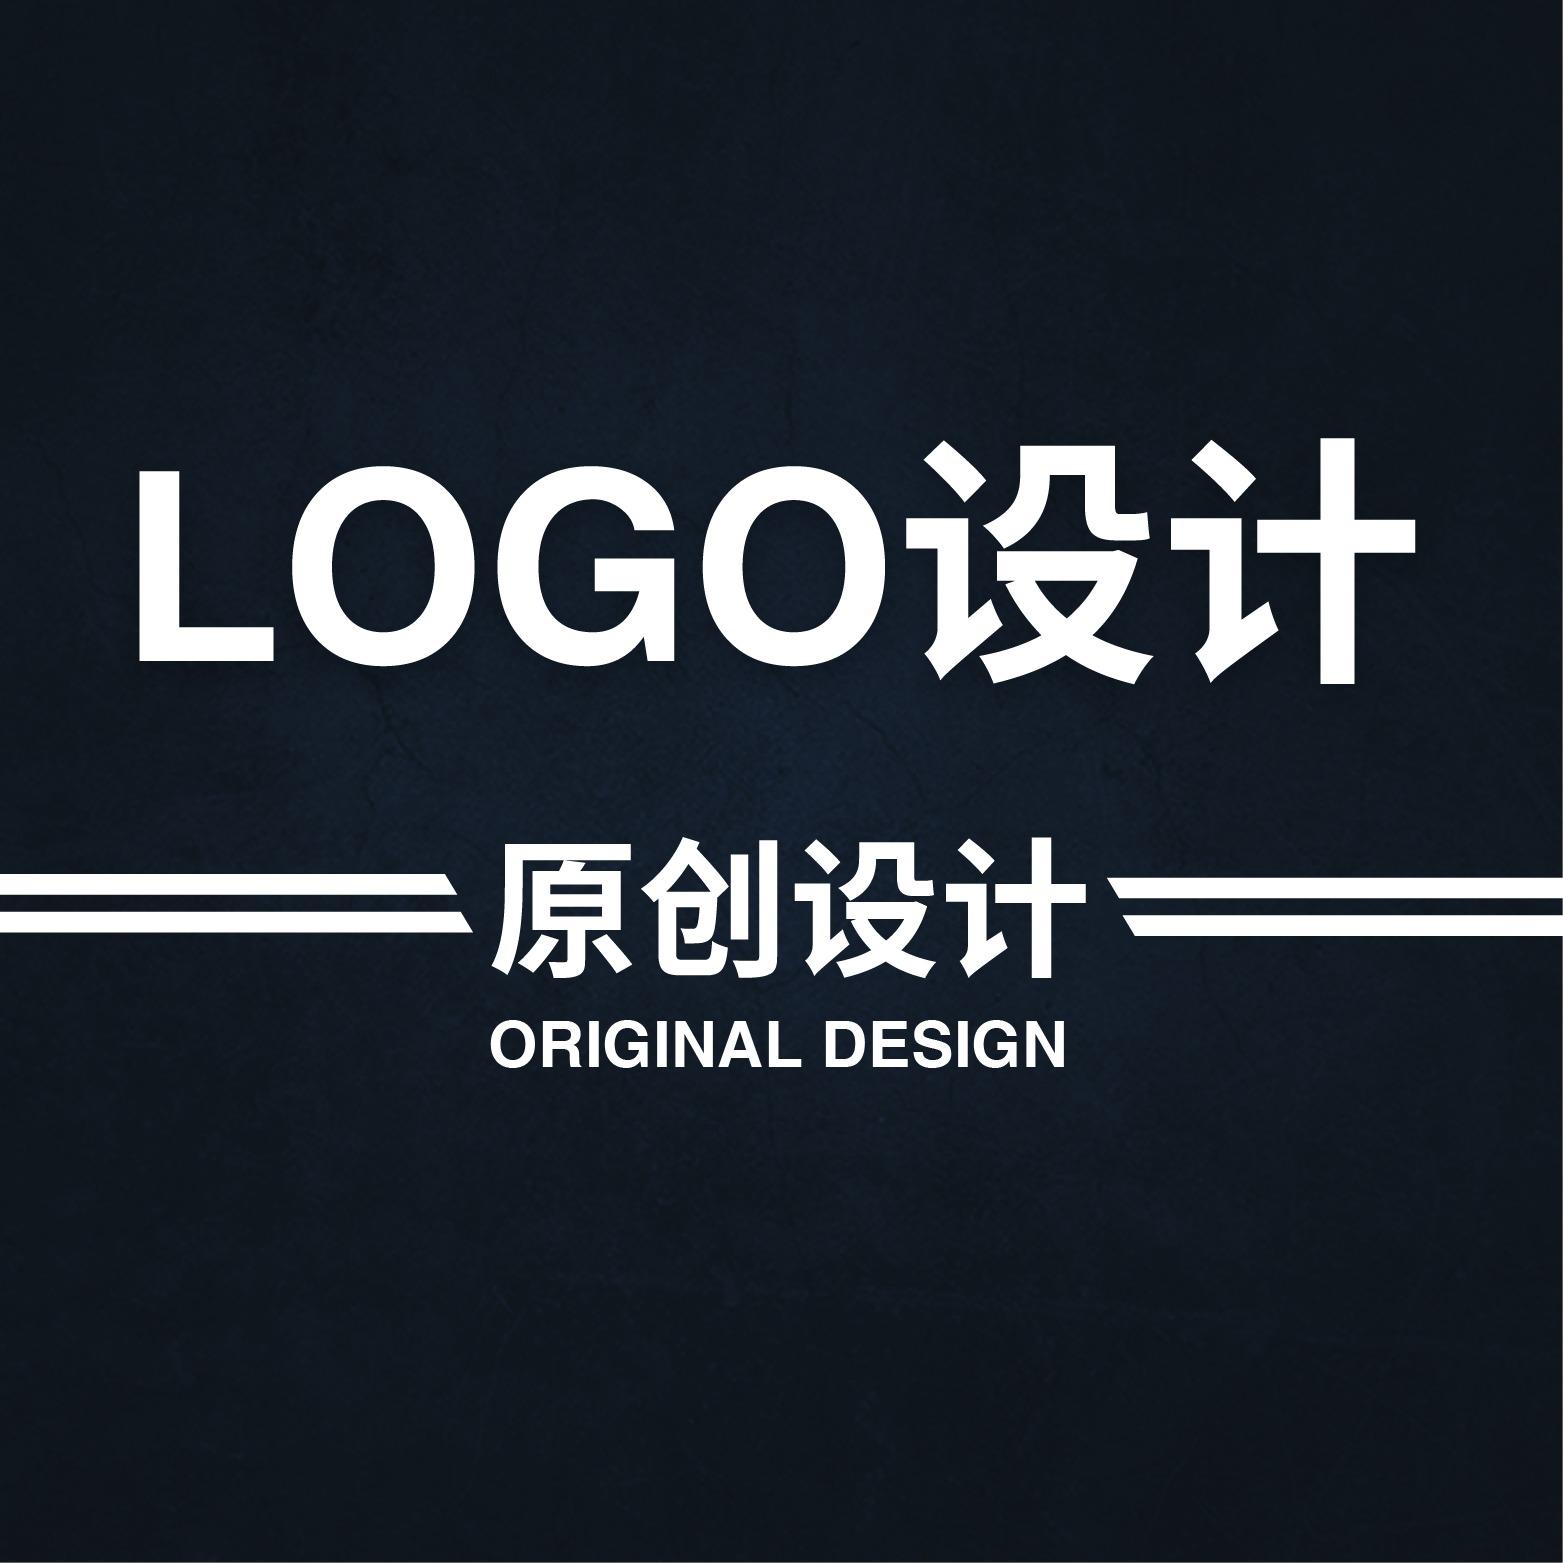 logo设计企业公司品牌产品餐饮教育工业科技logo品牌设计